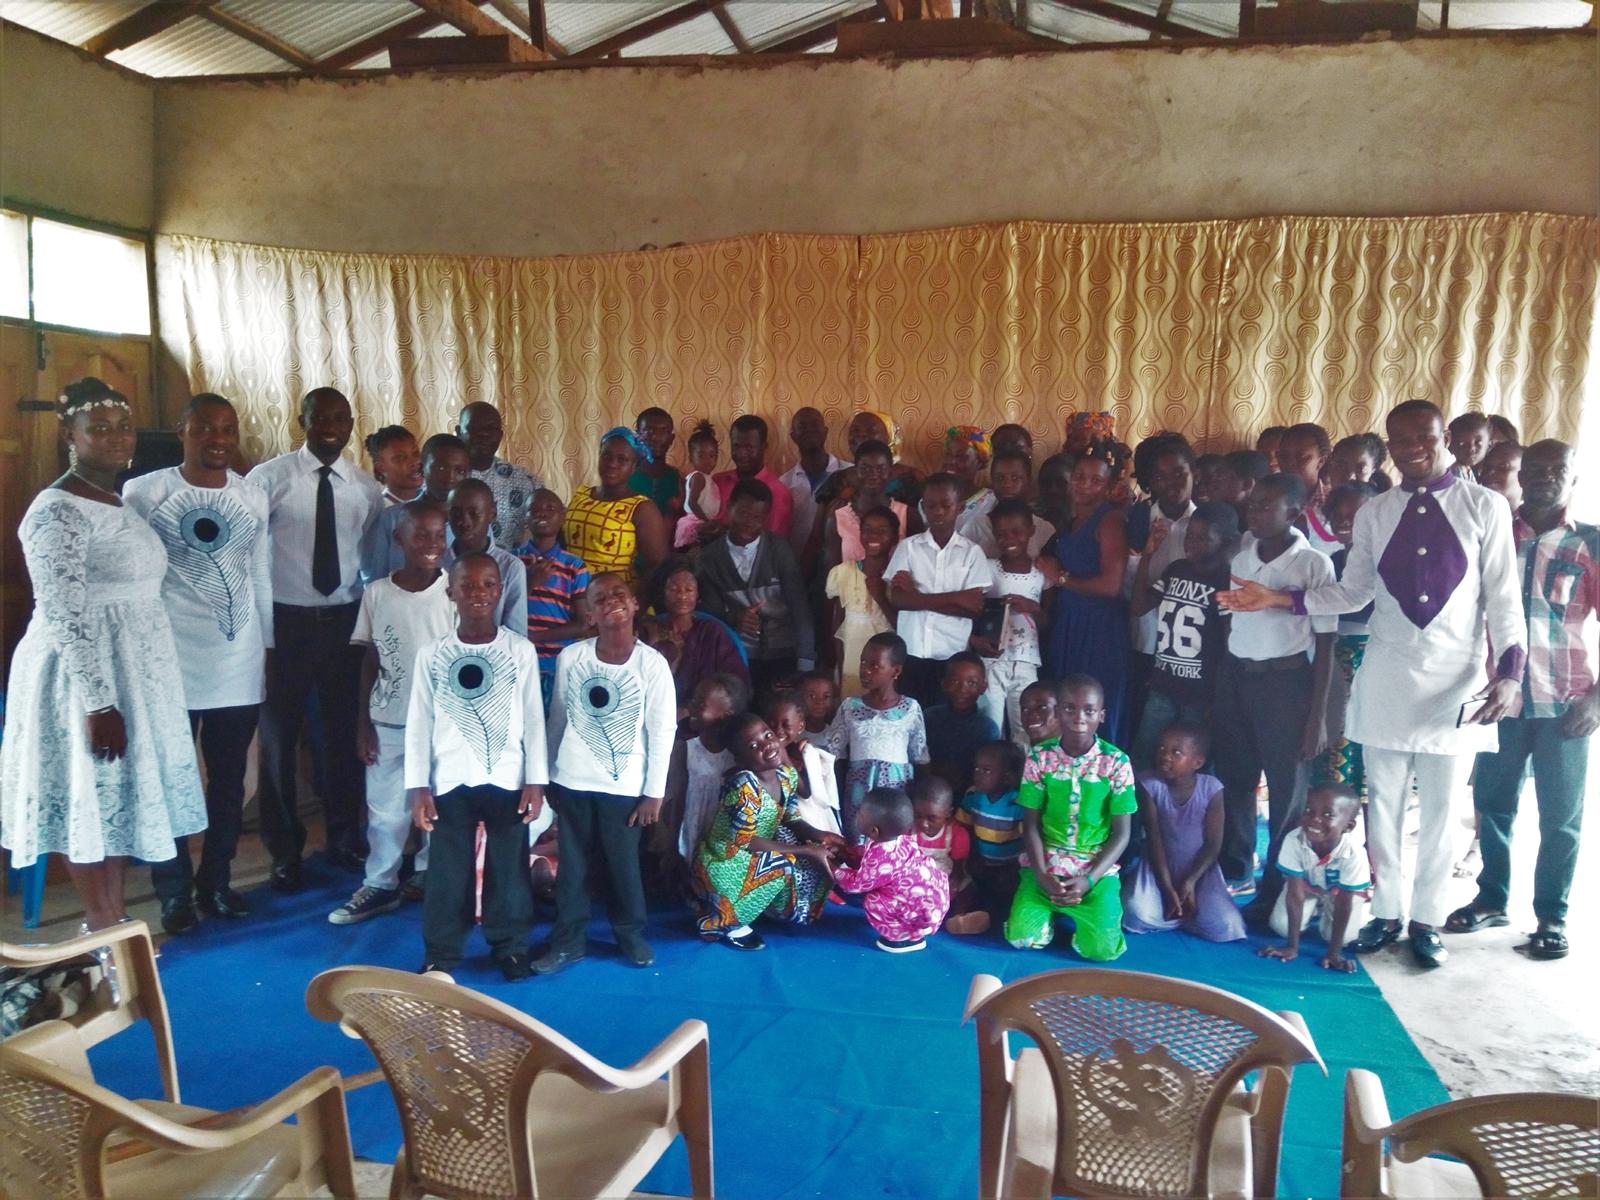 Pastor Gyasi Boateng and his church congregation